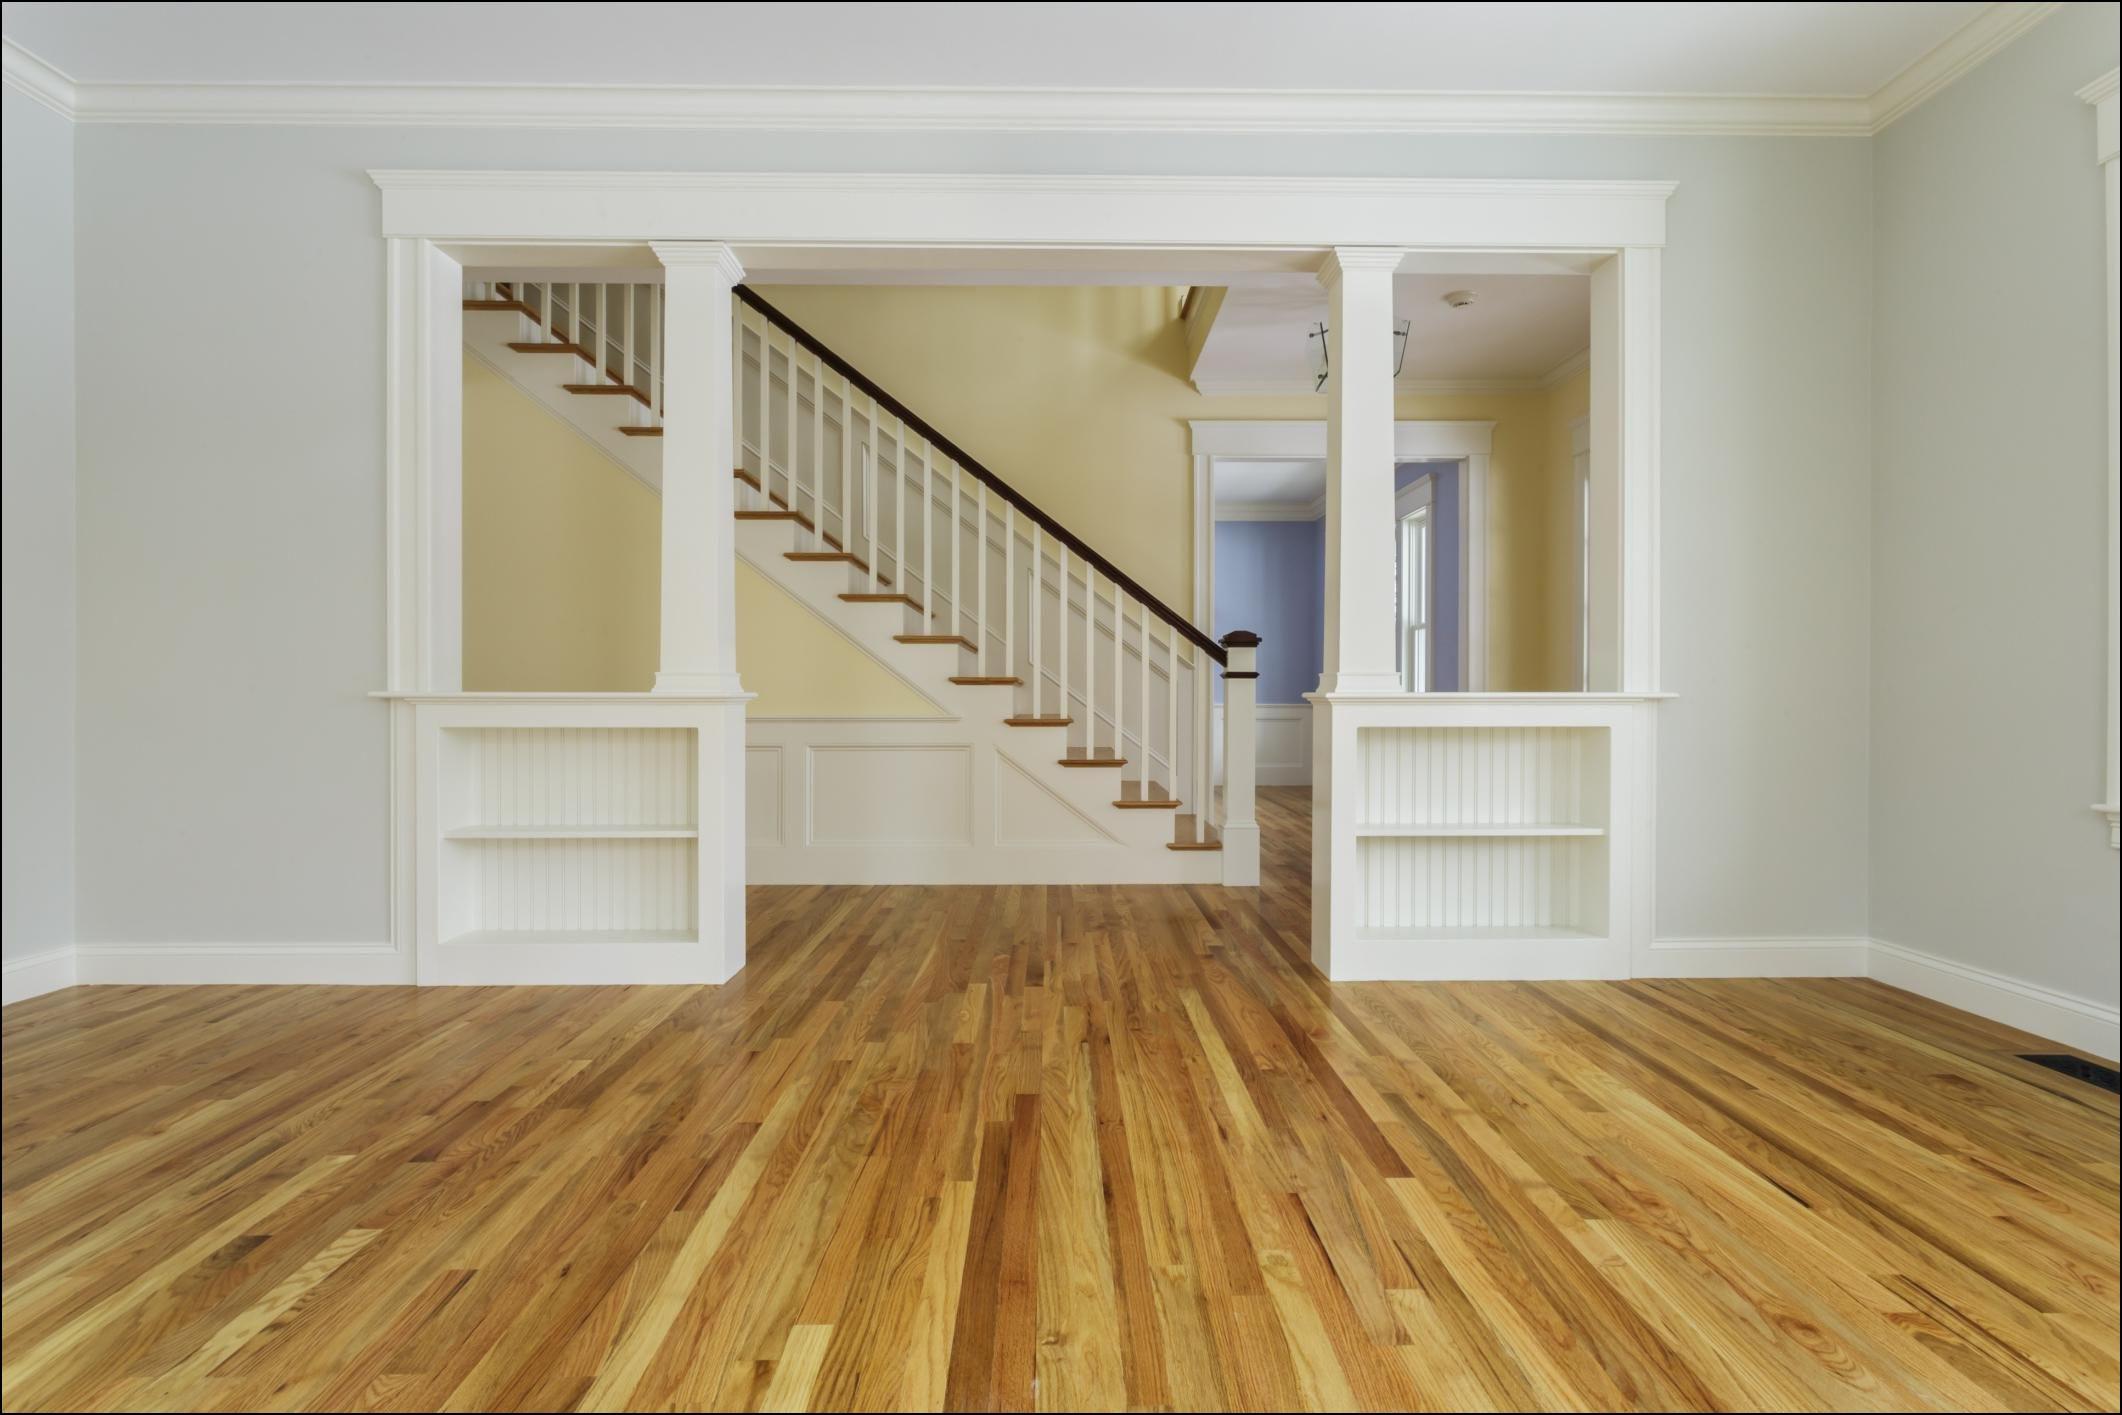 hardwood floor showroom los angeles of hardwood flooring suppliers france flooring ideas with hardwood flooring cost for 1000 square feet stock guide to solid hardwood floors of hardwood flooring